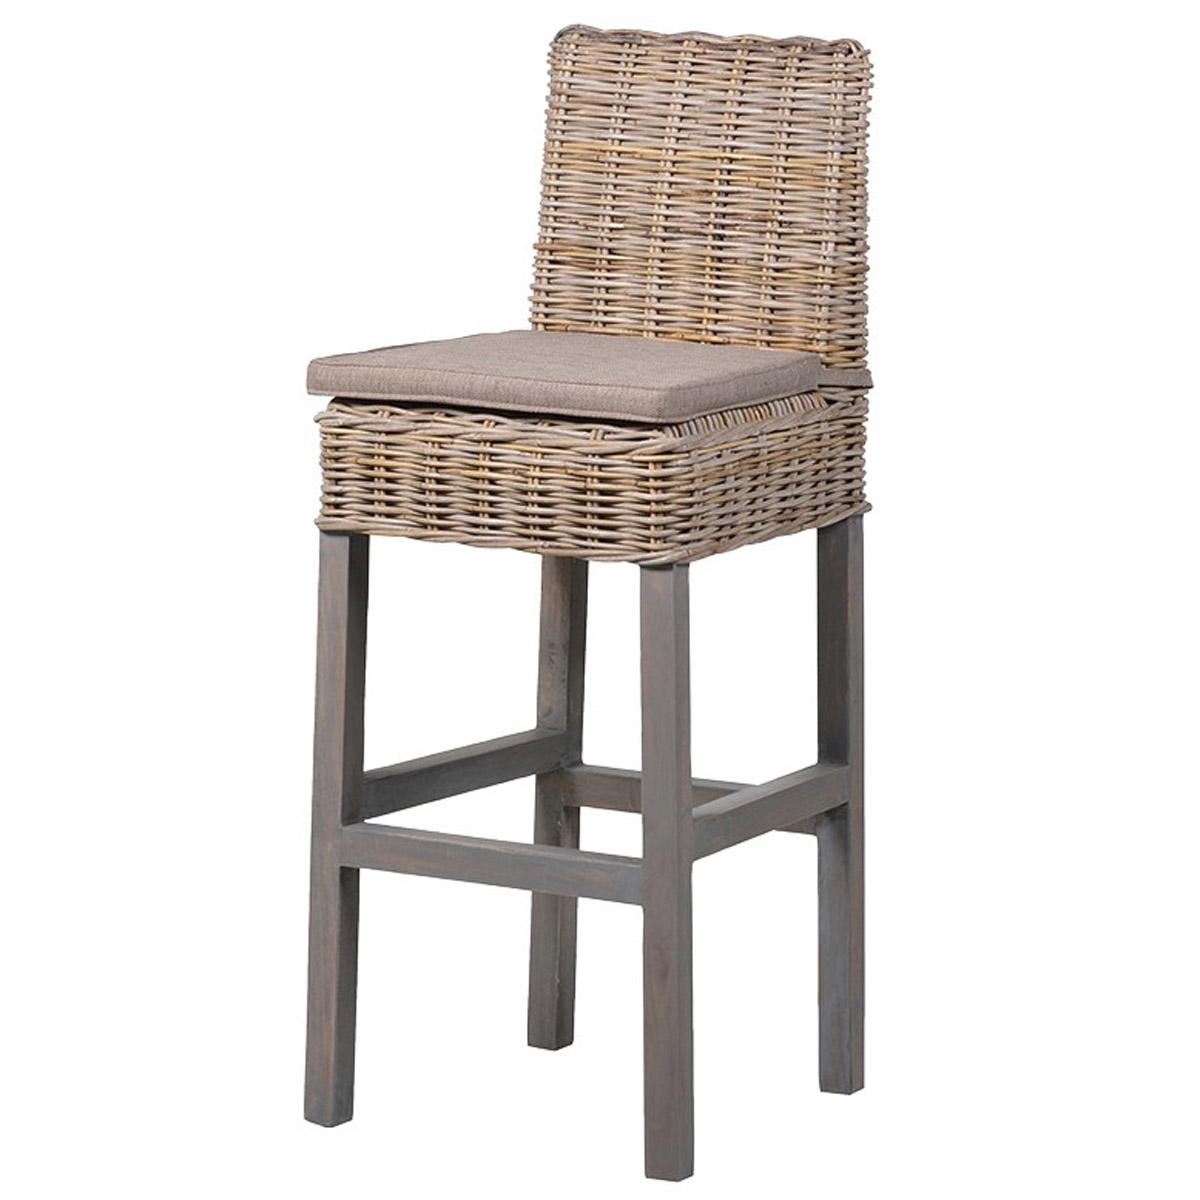 Pleasing New England Grey Wicker Bar Stool Machost Co Dining Chair Design Ideas Machostcouk